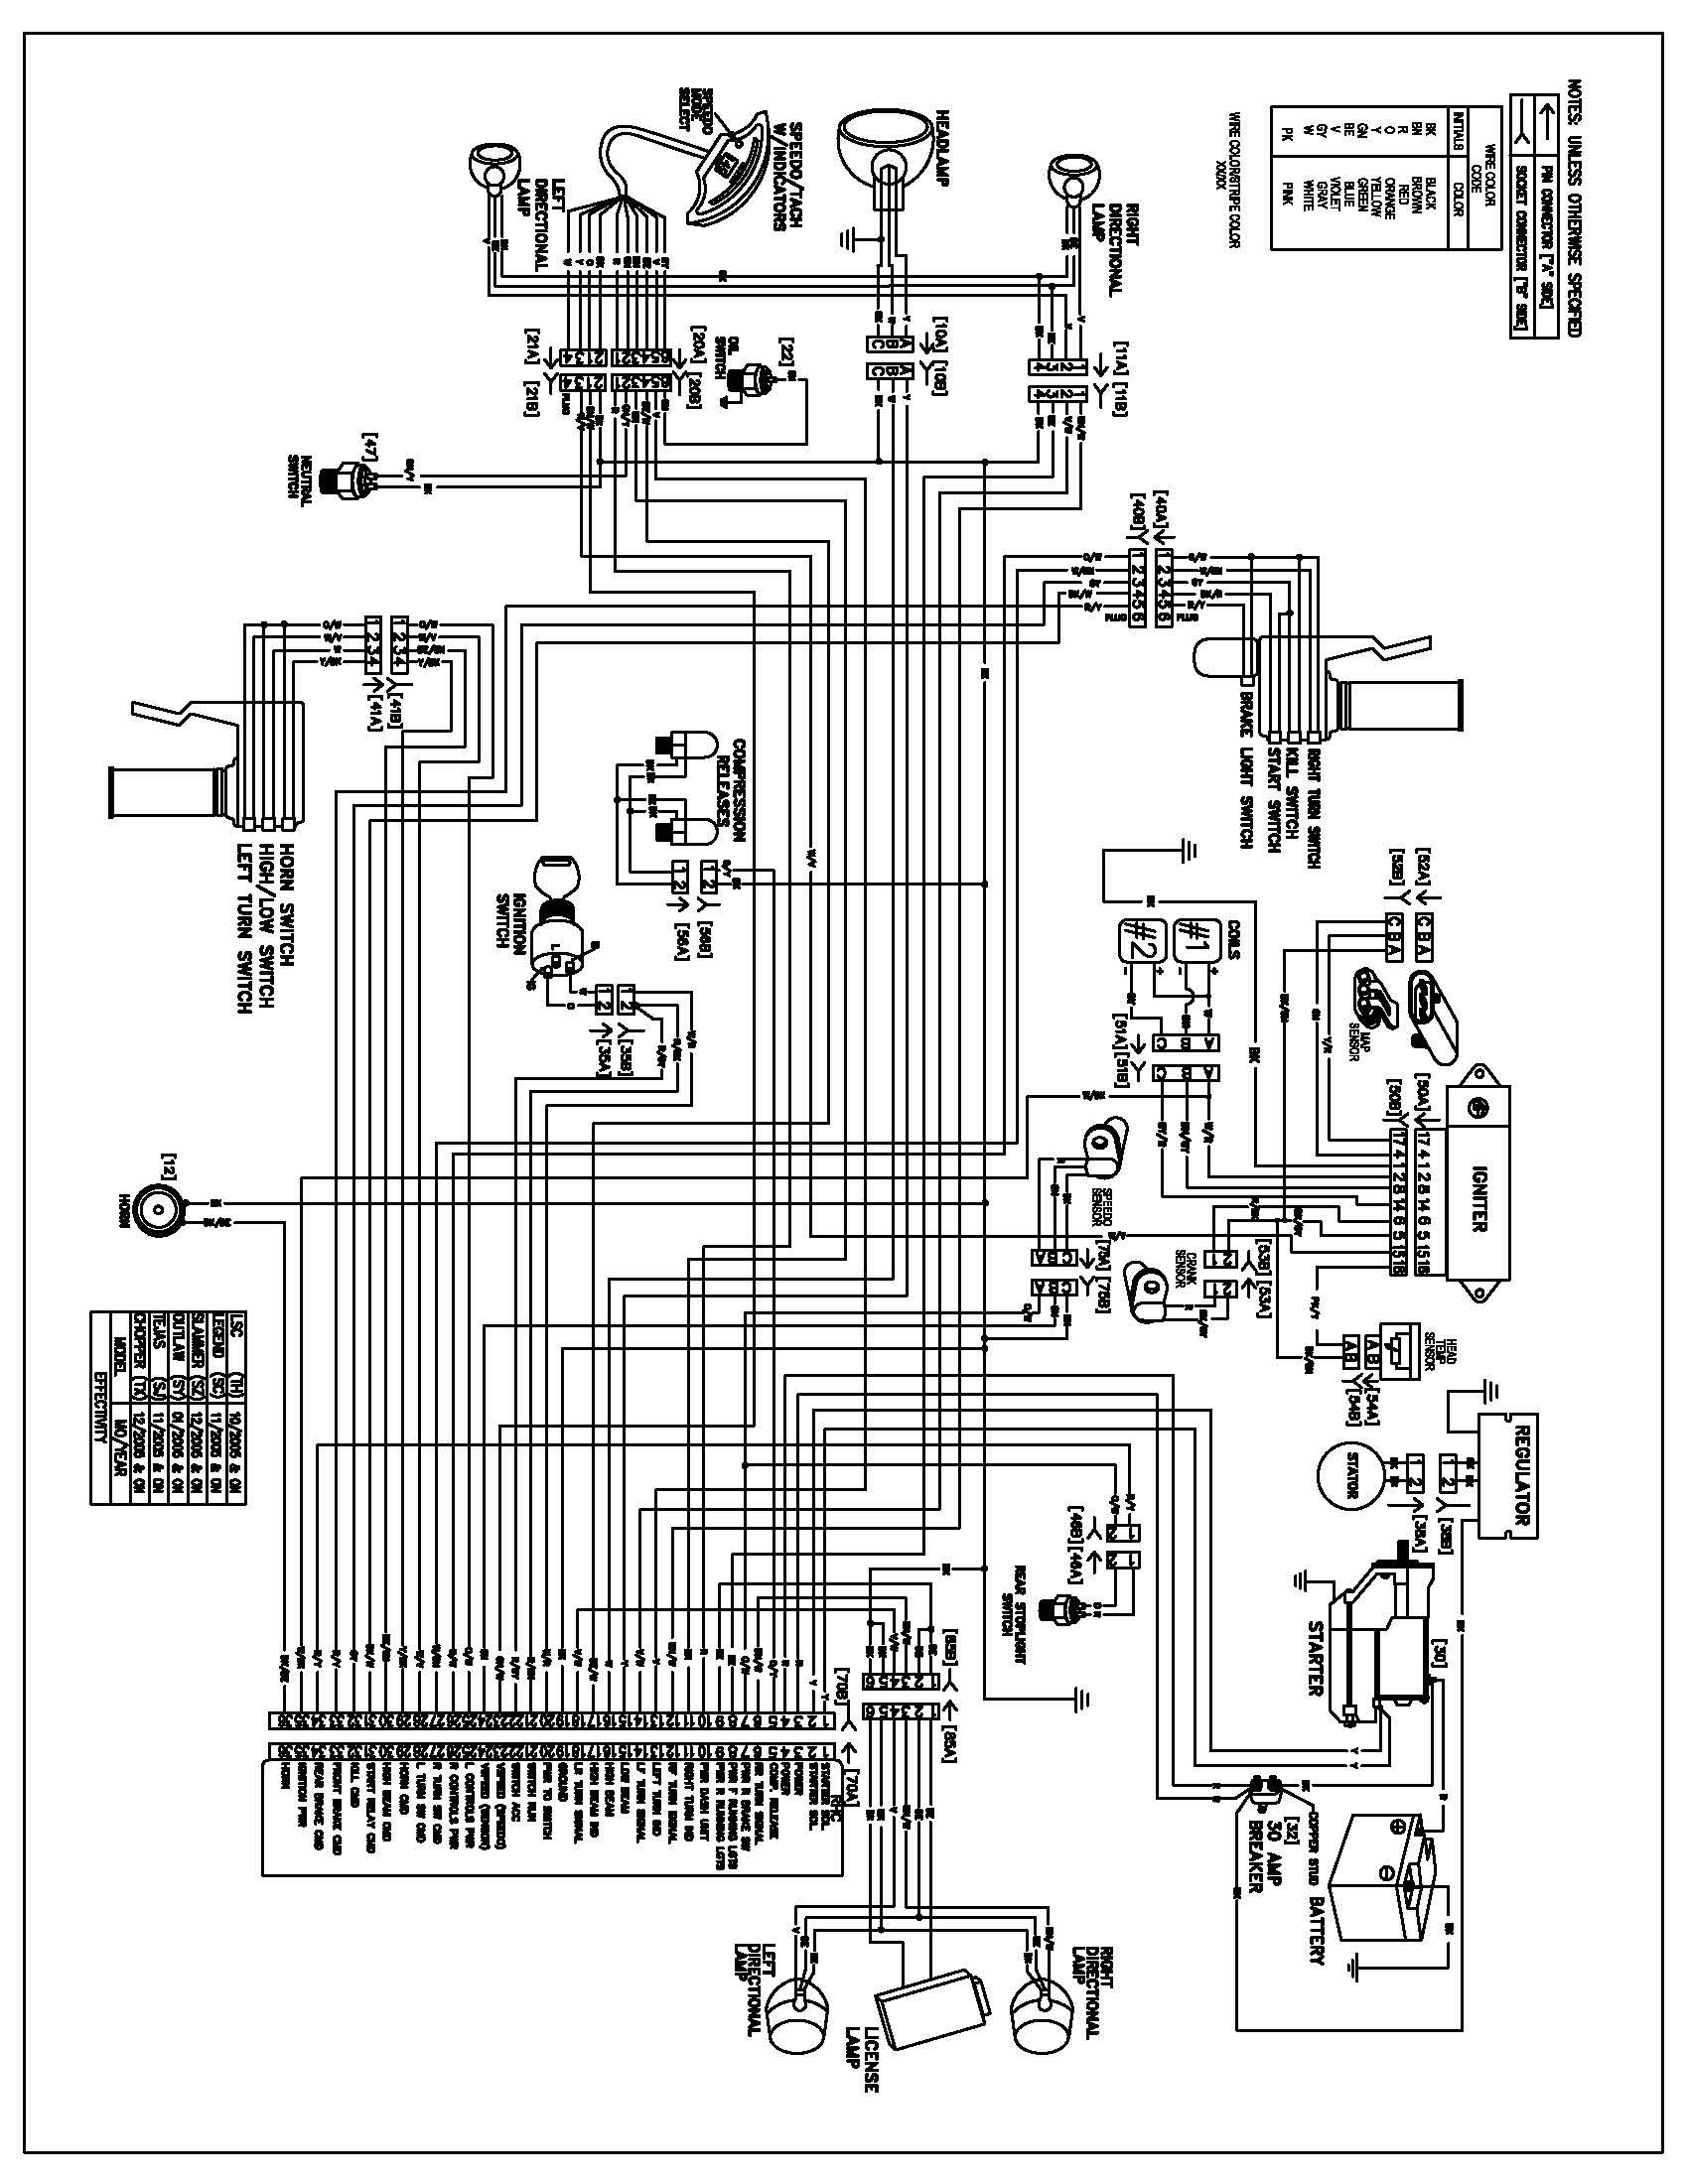 American Ironhorse Wiring Diagram